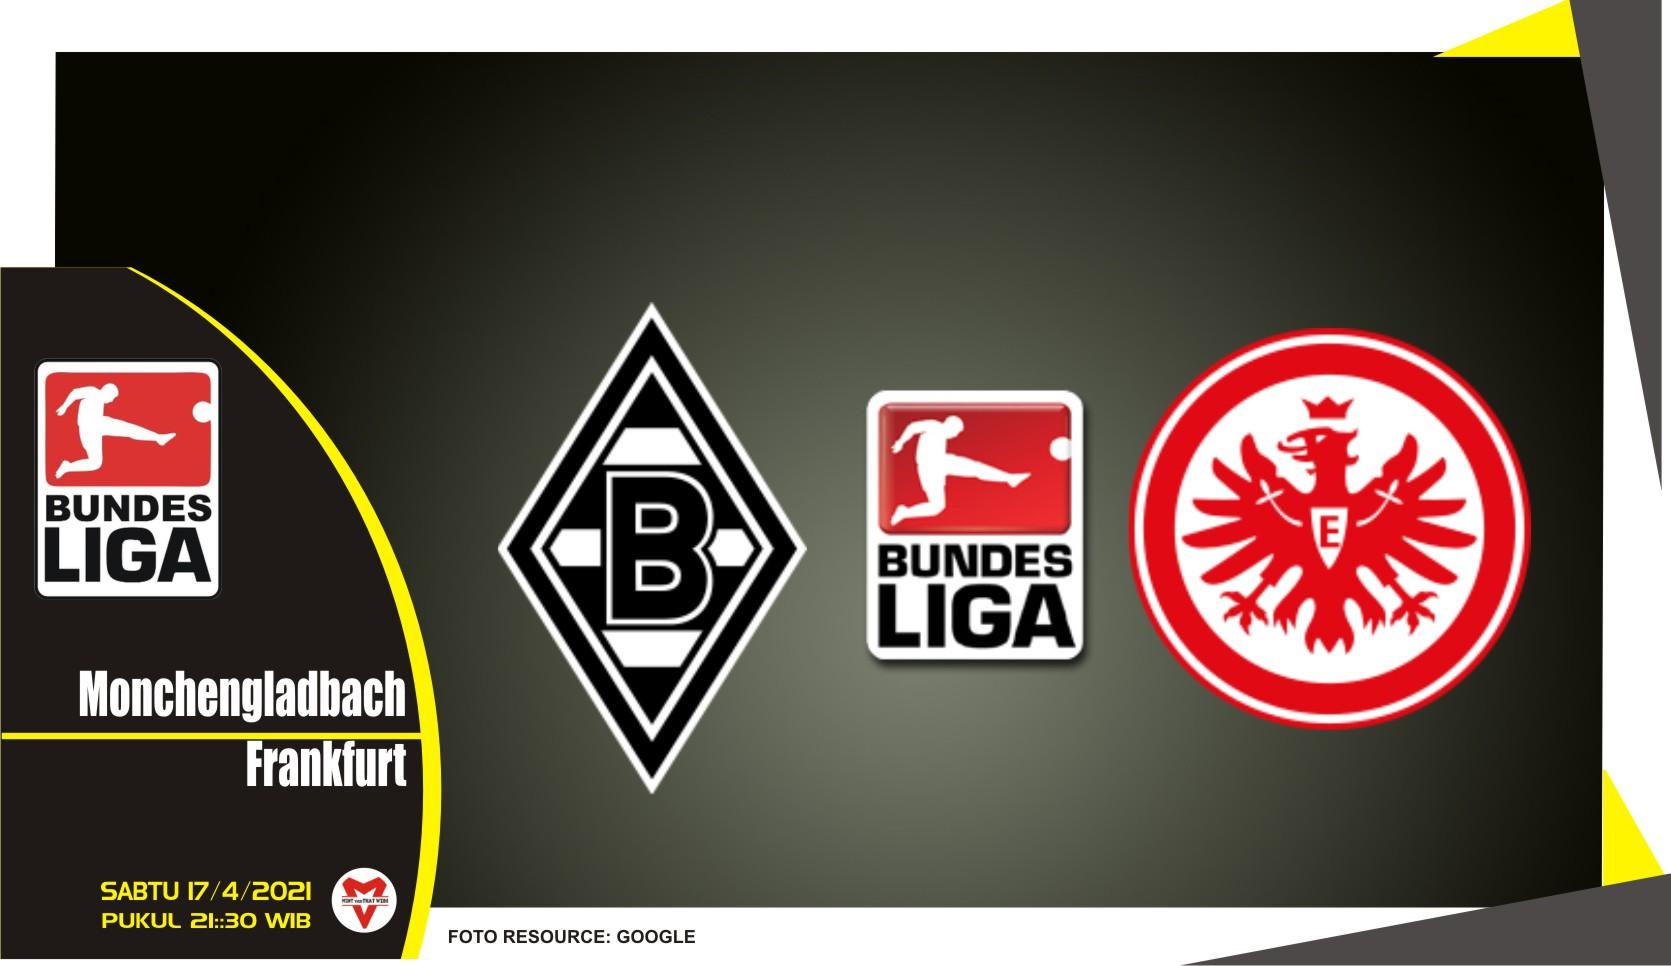 Prediksi Liga Jerman: Monchengladbach vs Eintracht Frankfurt - 17 April 2021